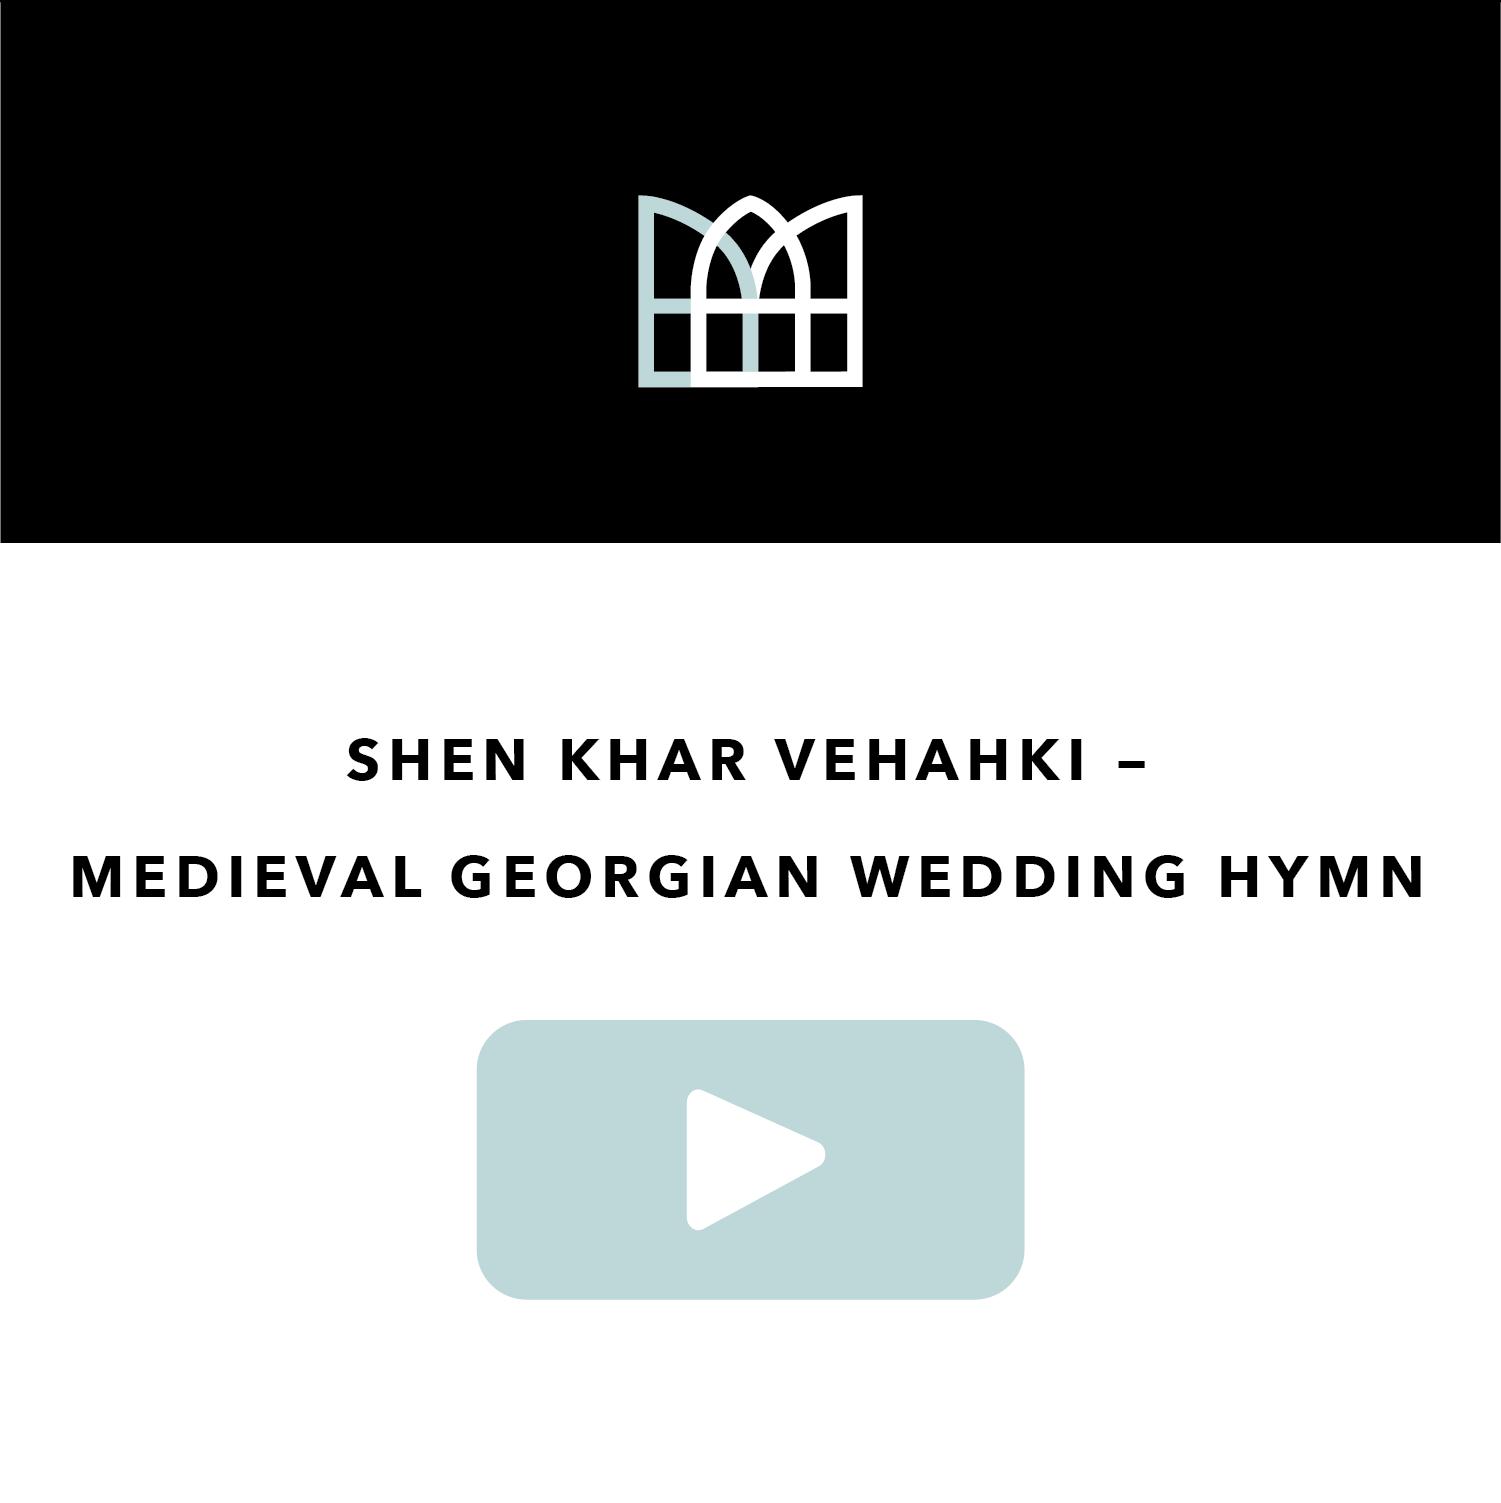 Shen Khar Vehahki - Medieval Georgian Wedding Hymn